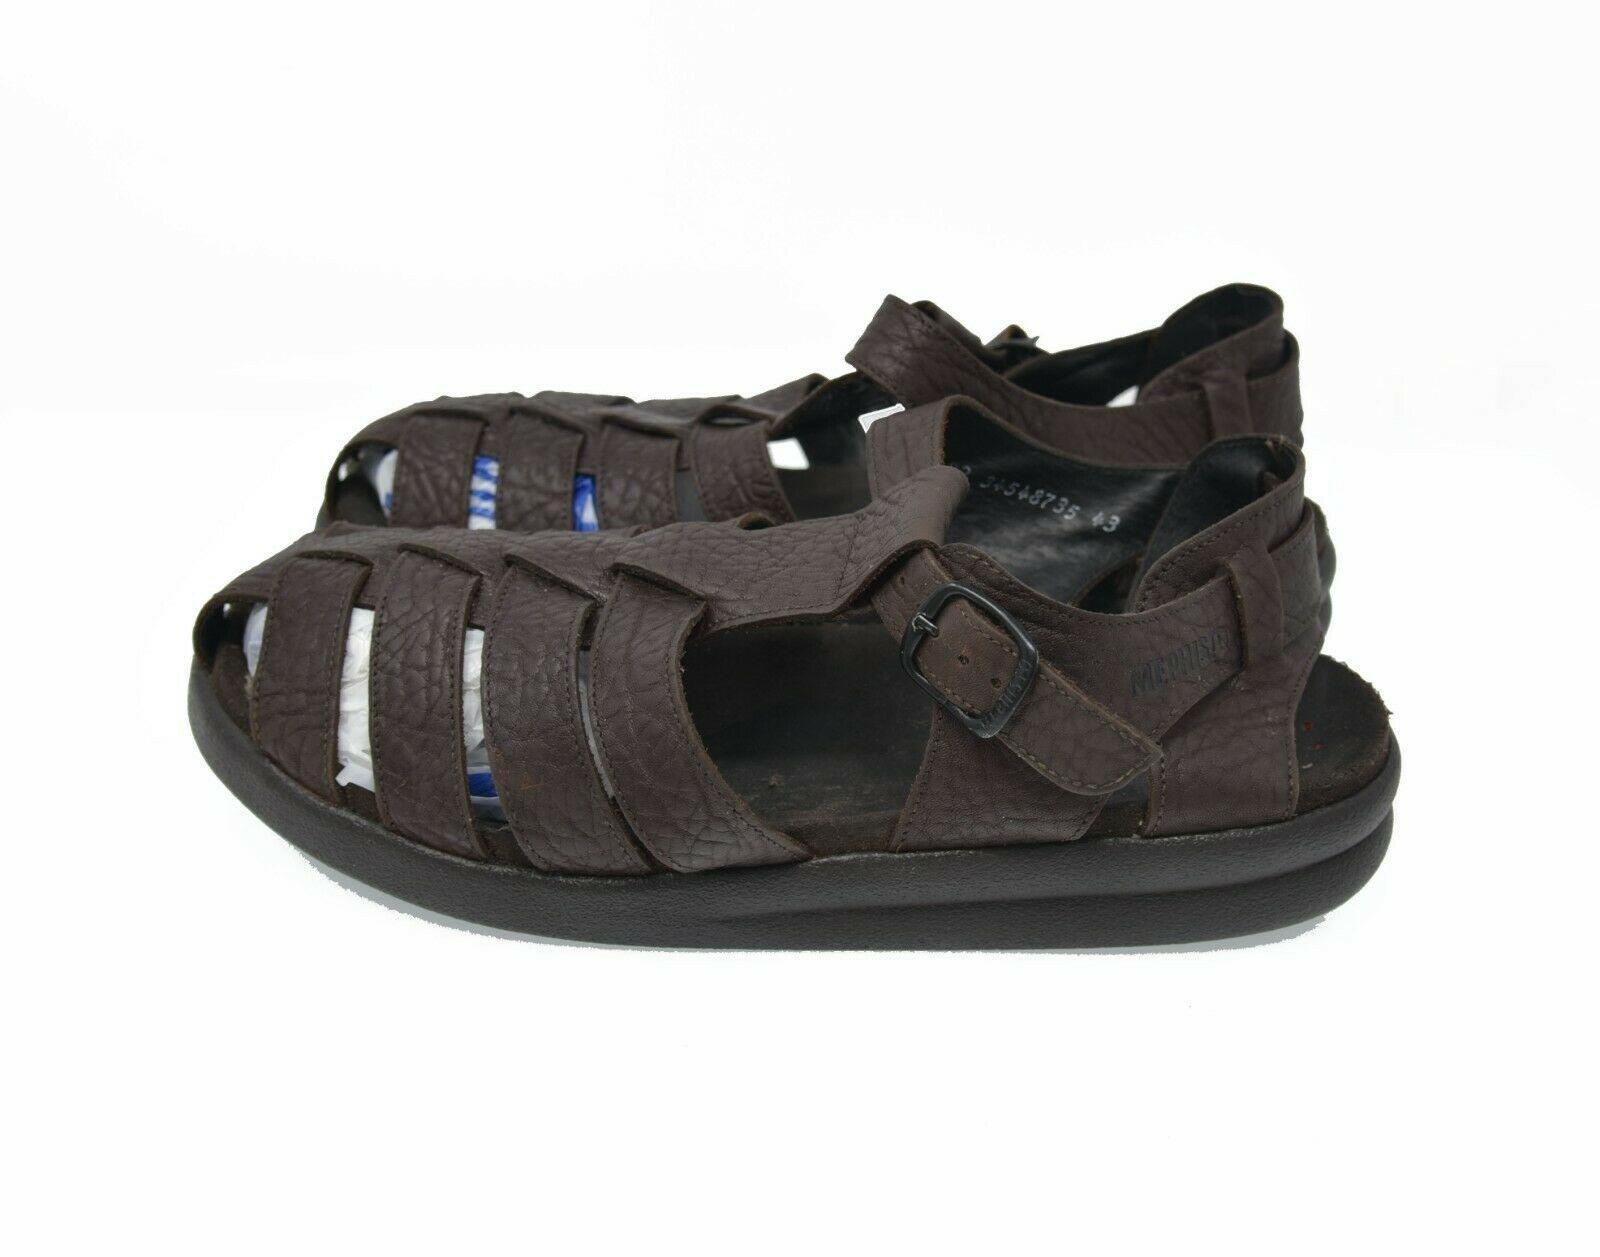 MEPHISTO Men's Sz 9 EU 43 Brown Pebbled Leather Fisherman Strap Sandals